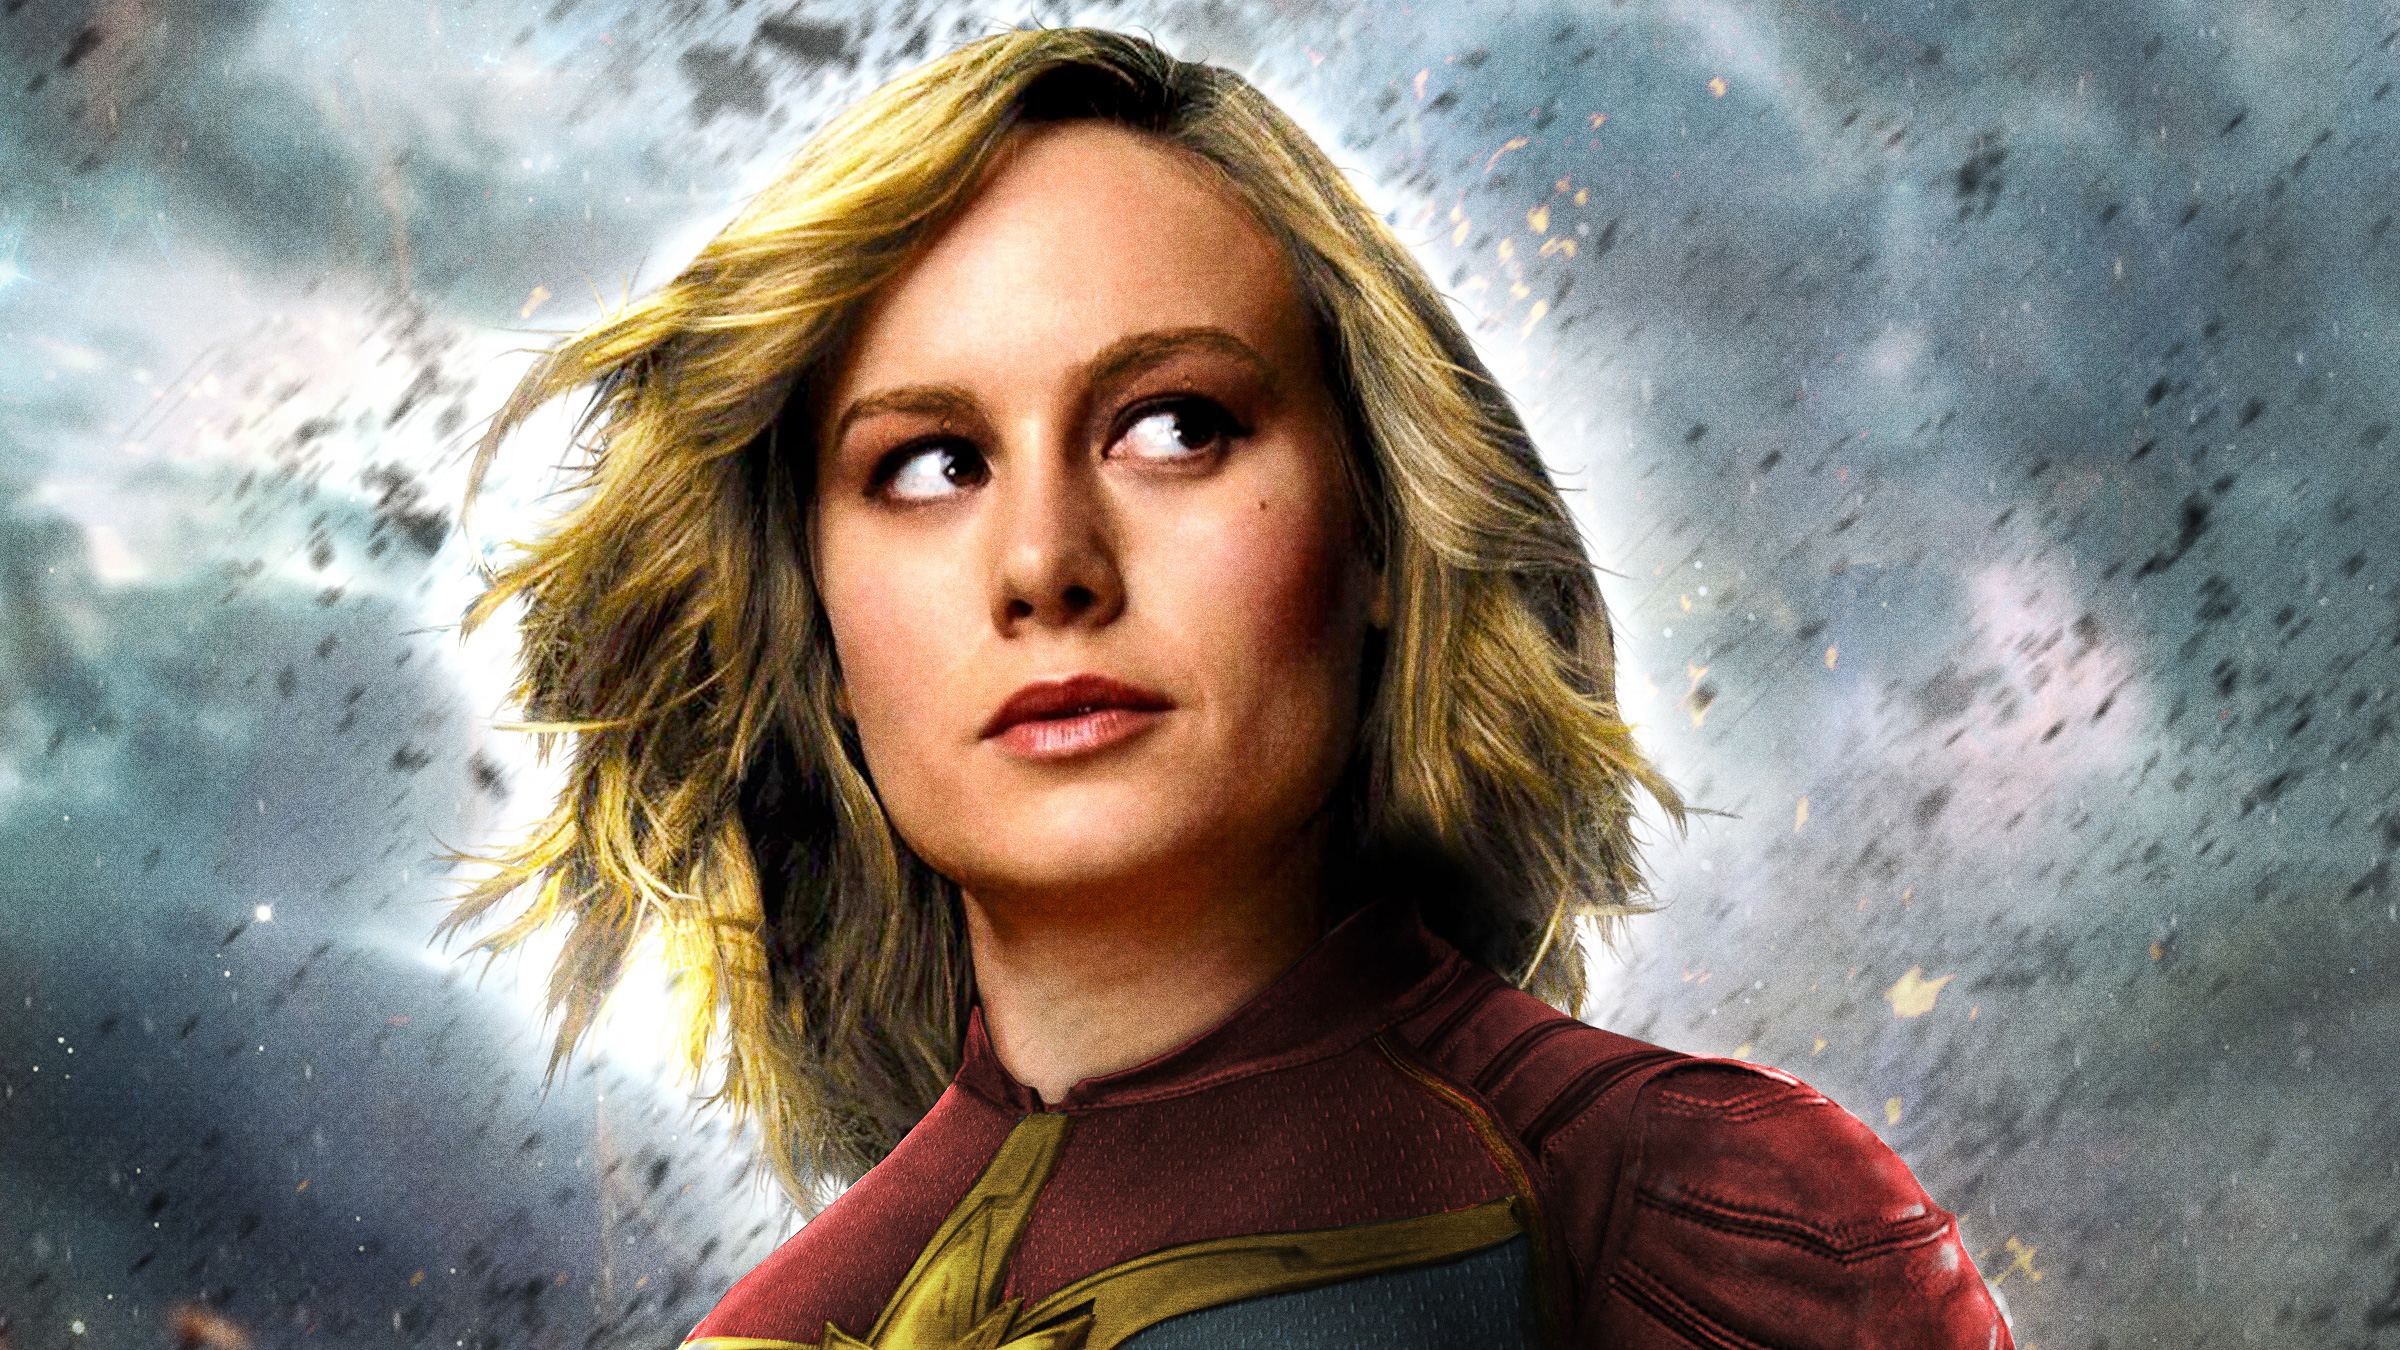 Wallpaper 4k Captain Marvel Movie 2019 2018 Movies Wallpapers